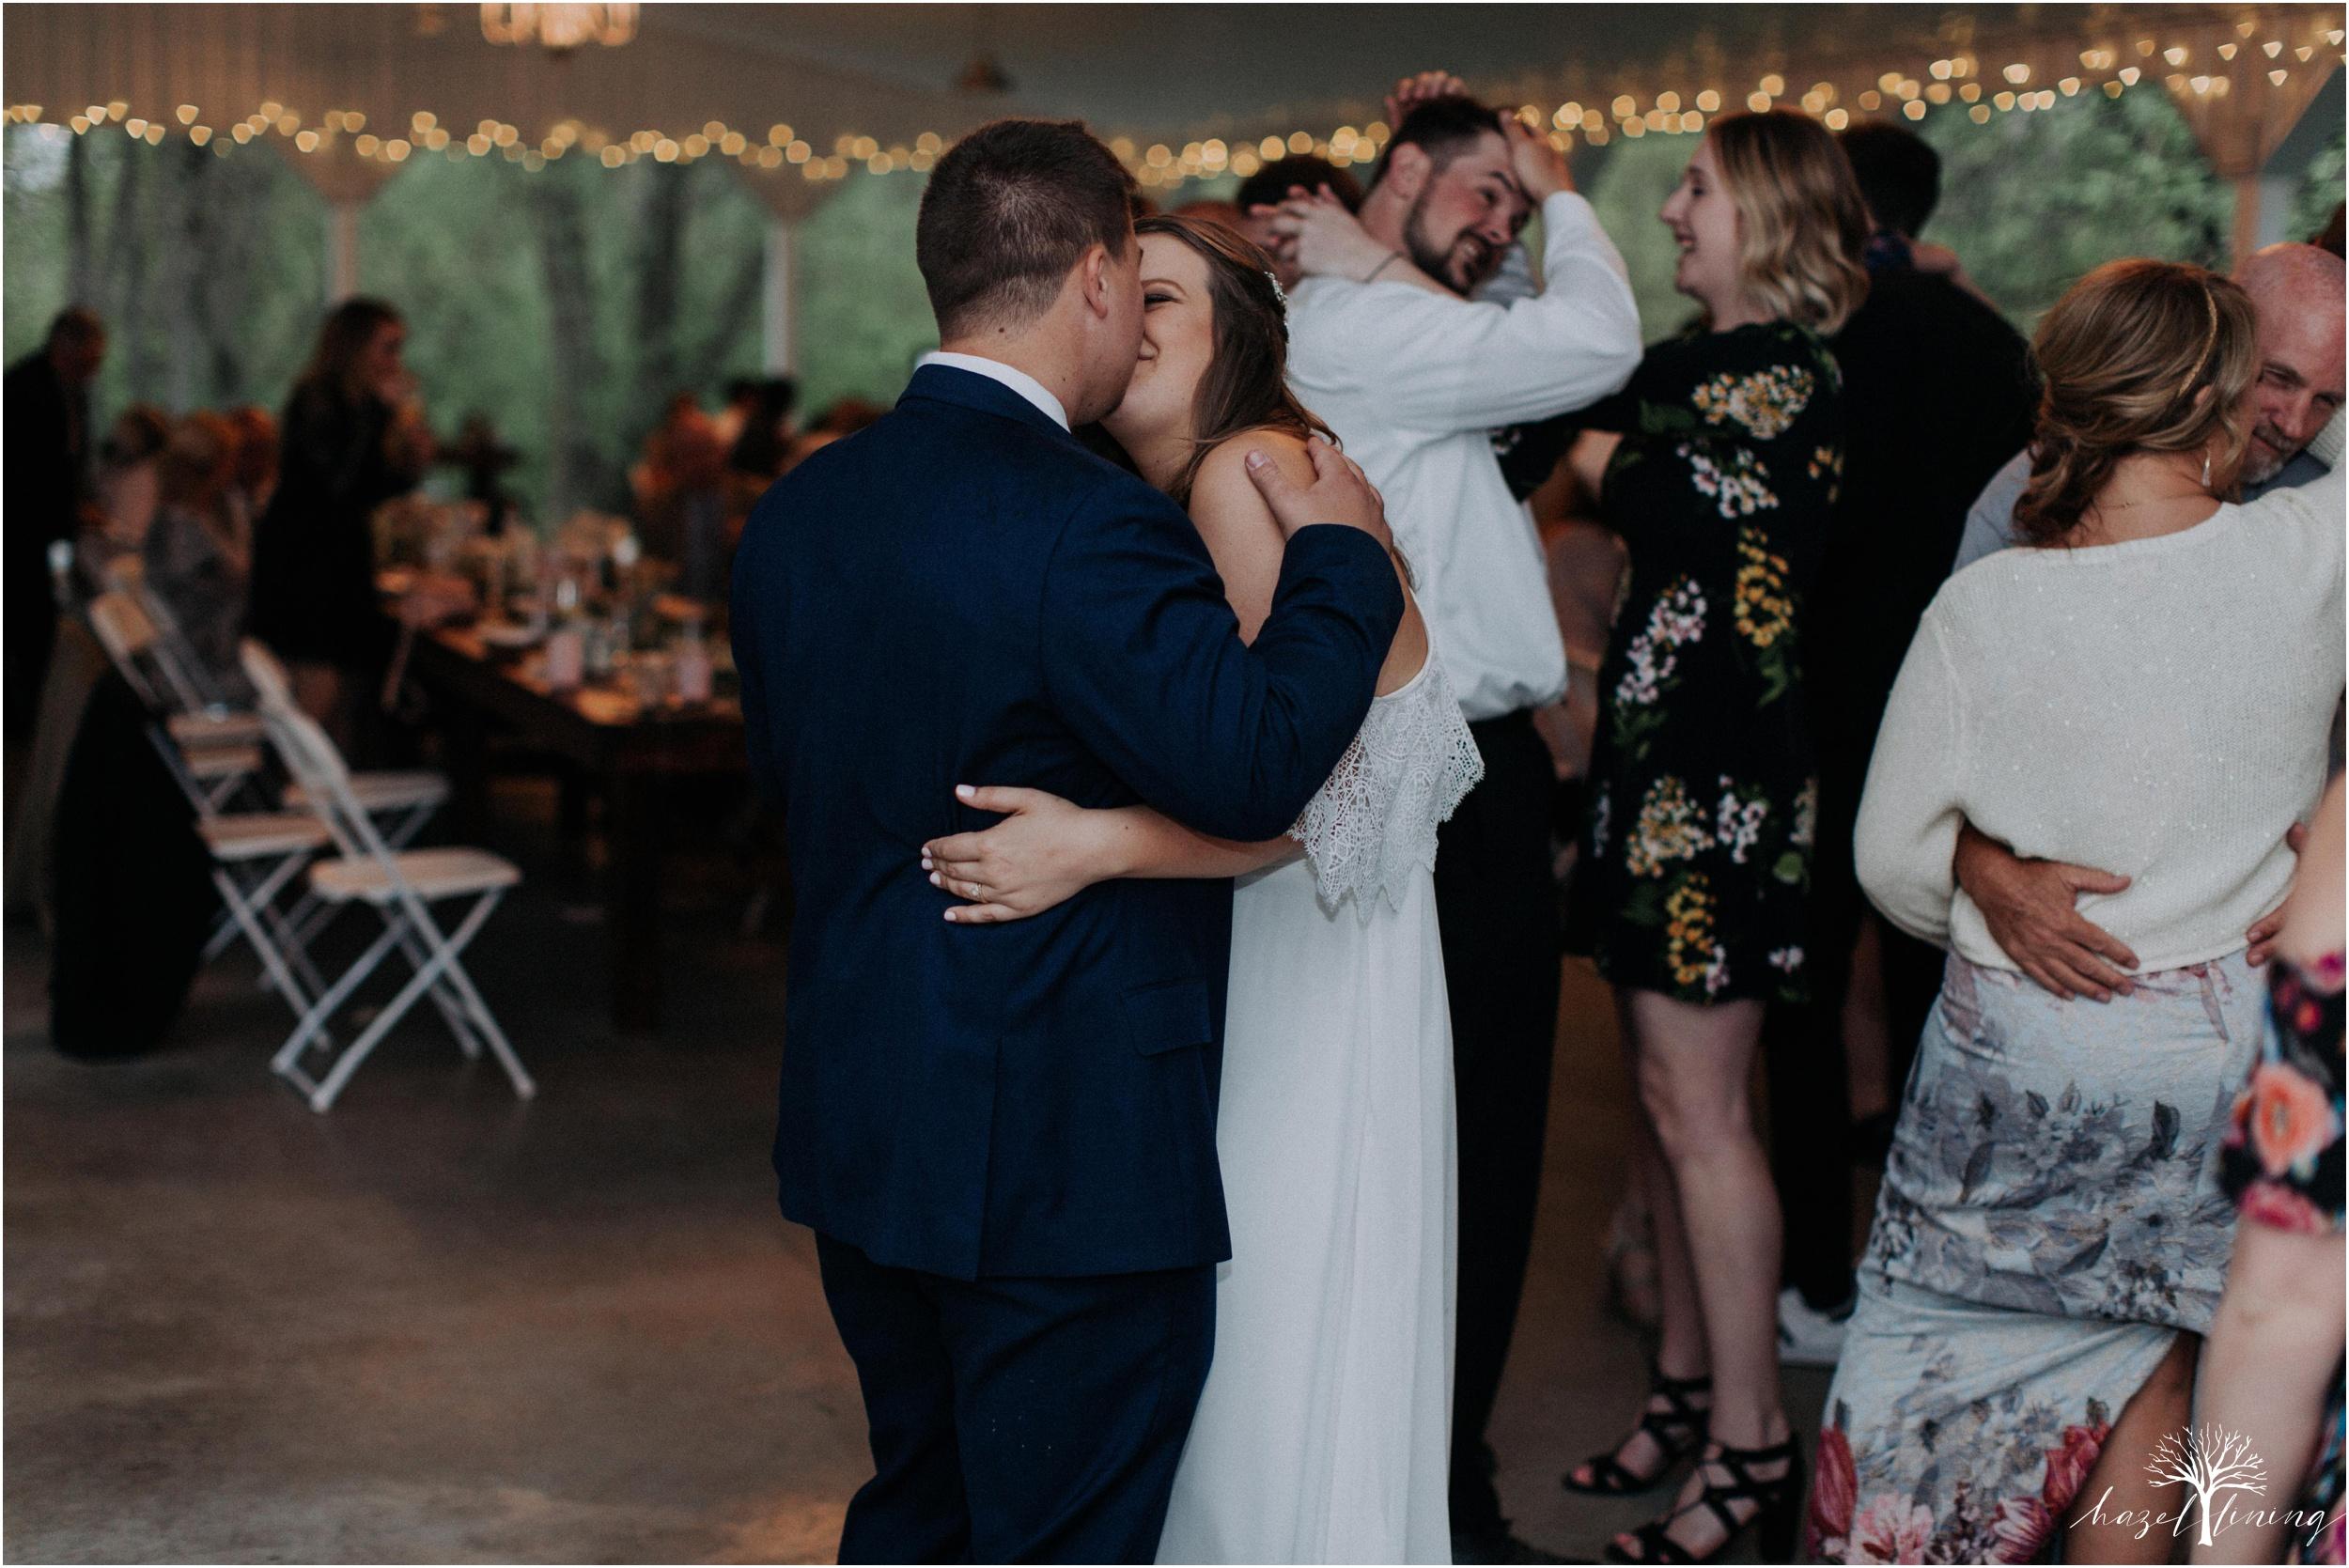 hazel-lining-travel-wedding-elopement-photography-abby-skyler-hunt-the-willis-house-york-pennsylvania-outdoor-estate-wedding_0152.jpg